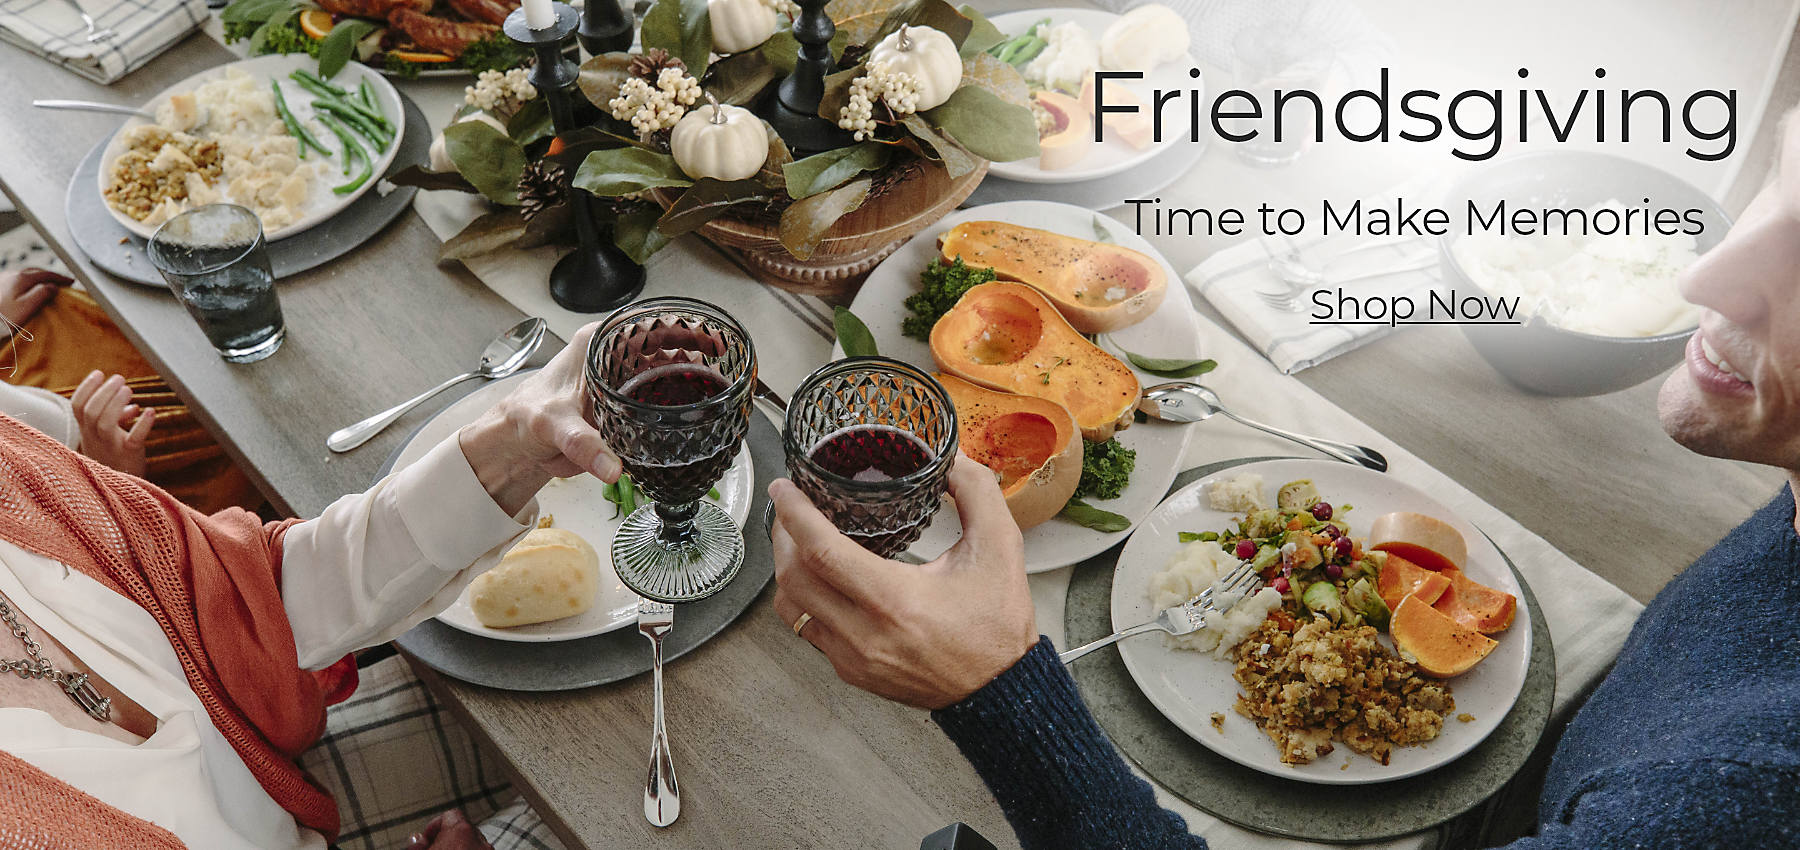 Friendsgiving Time to Make Memories